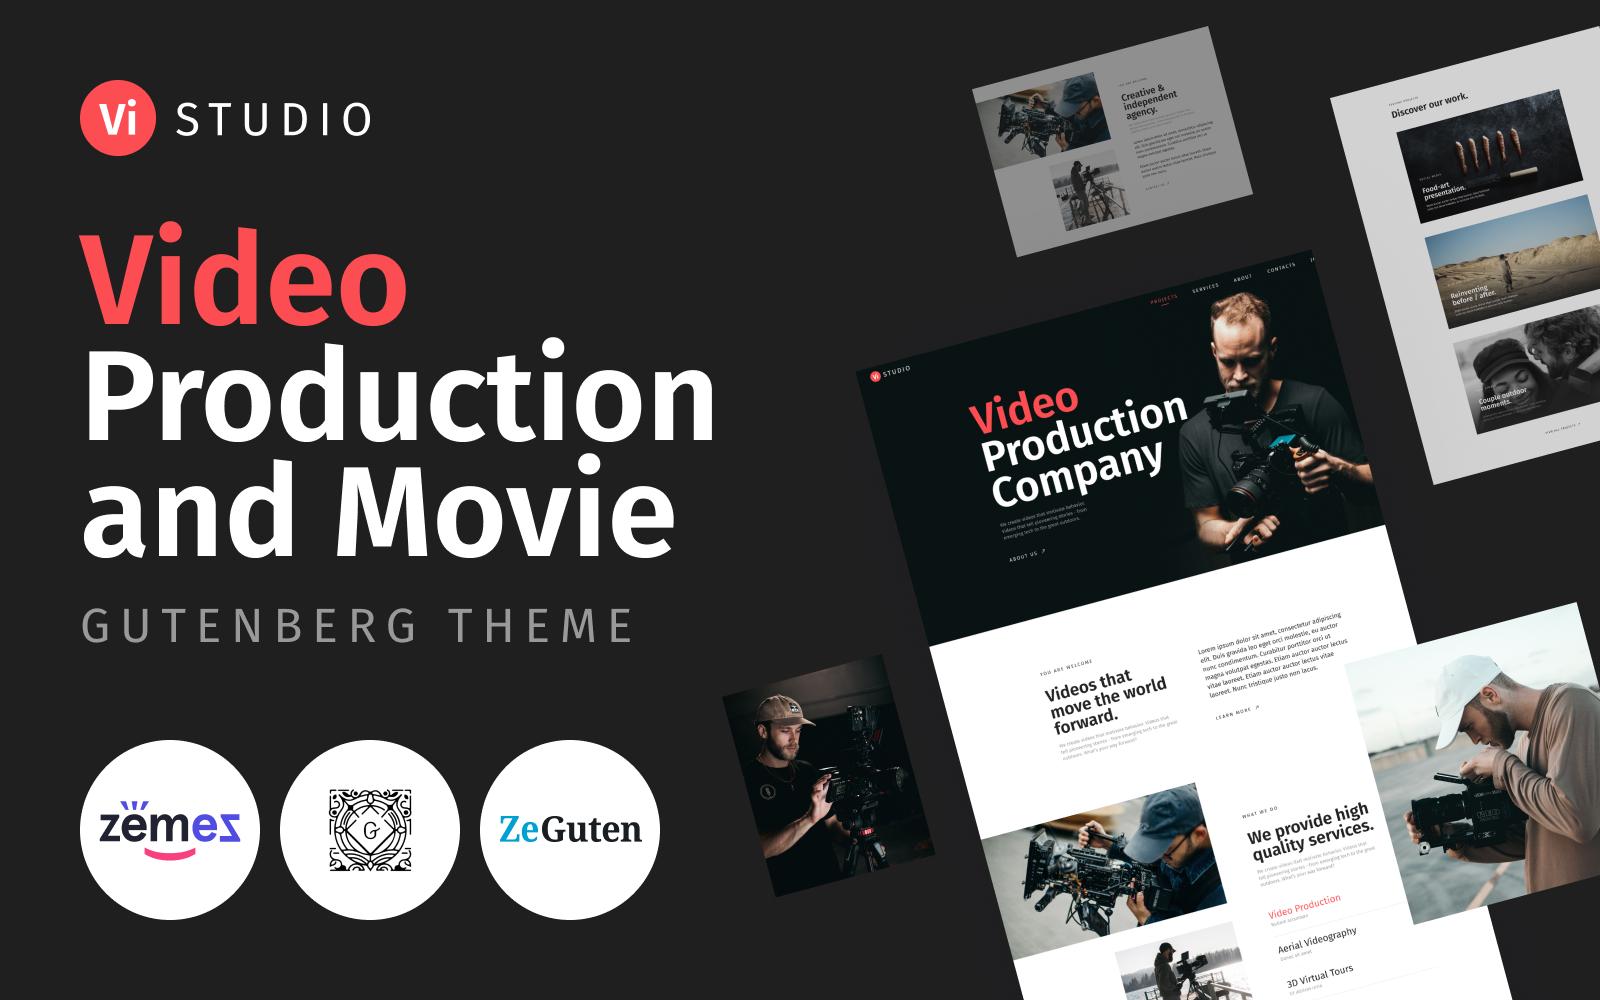 """Vistudio - Video Production and Movie"" 响应式WordPress模板 #116426"